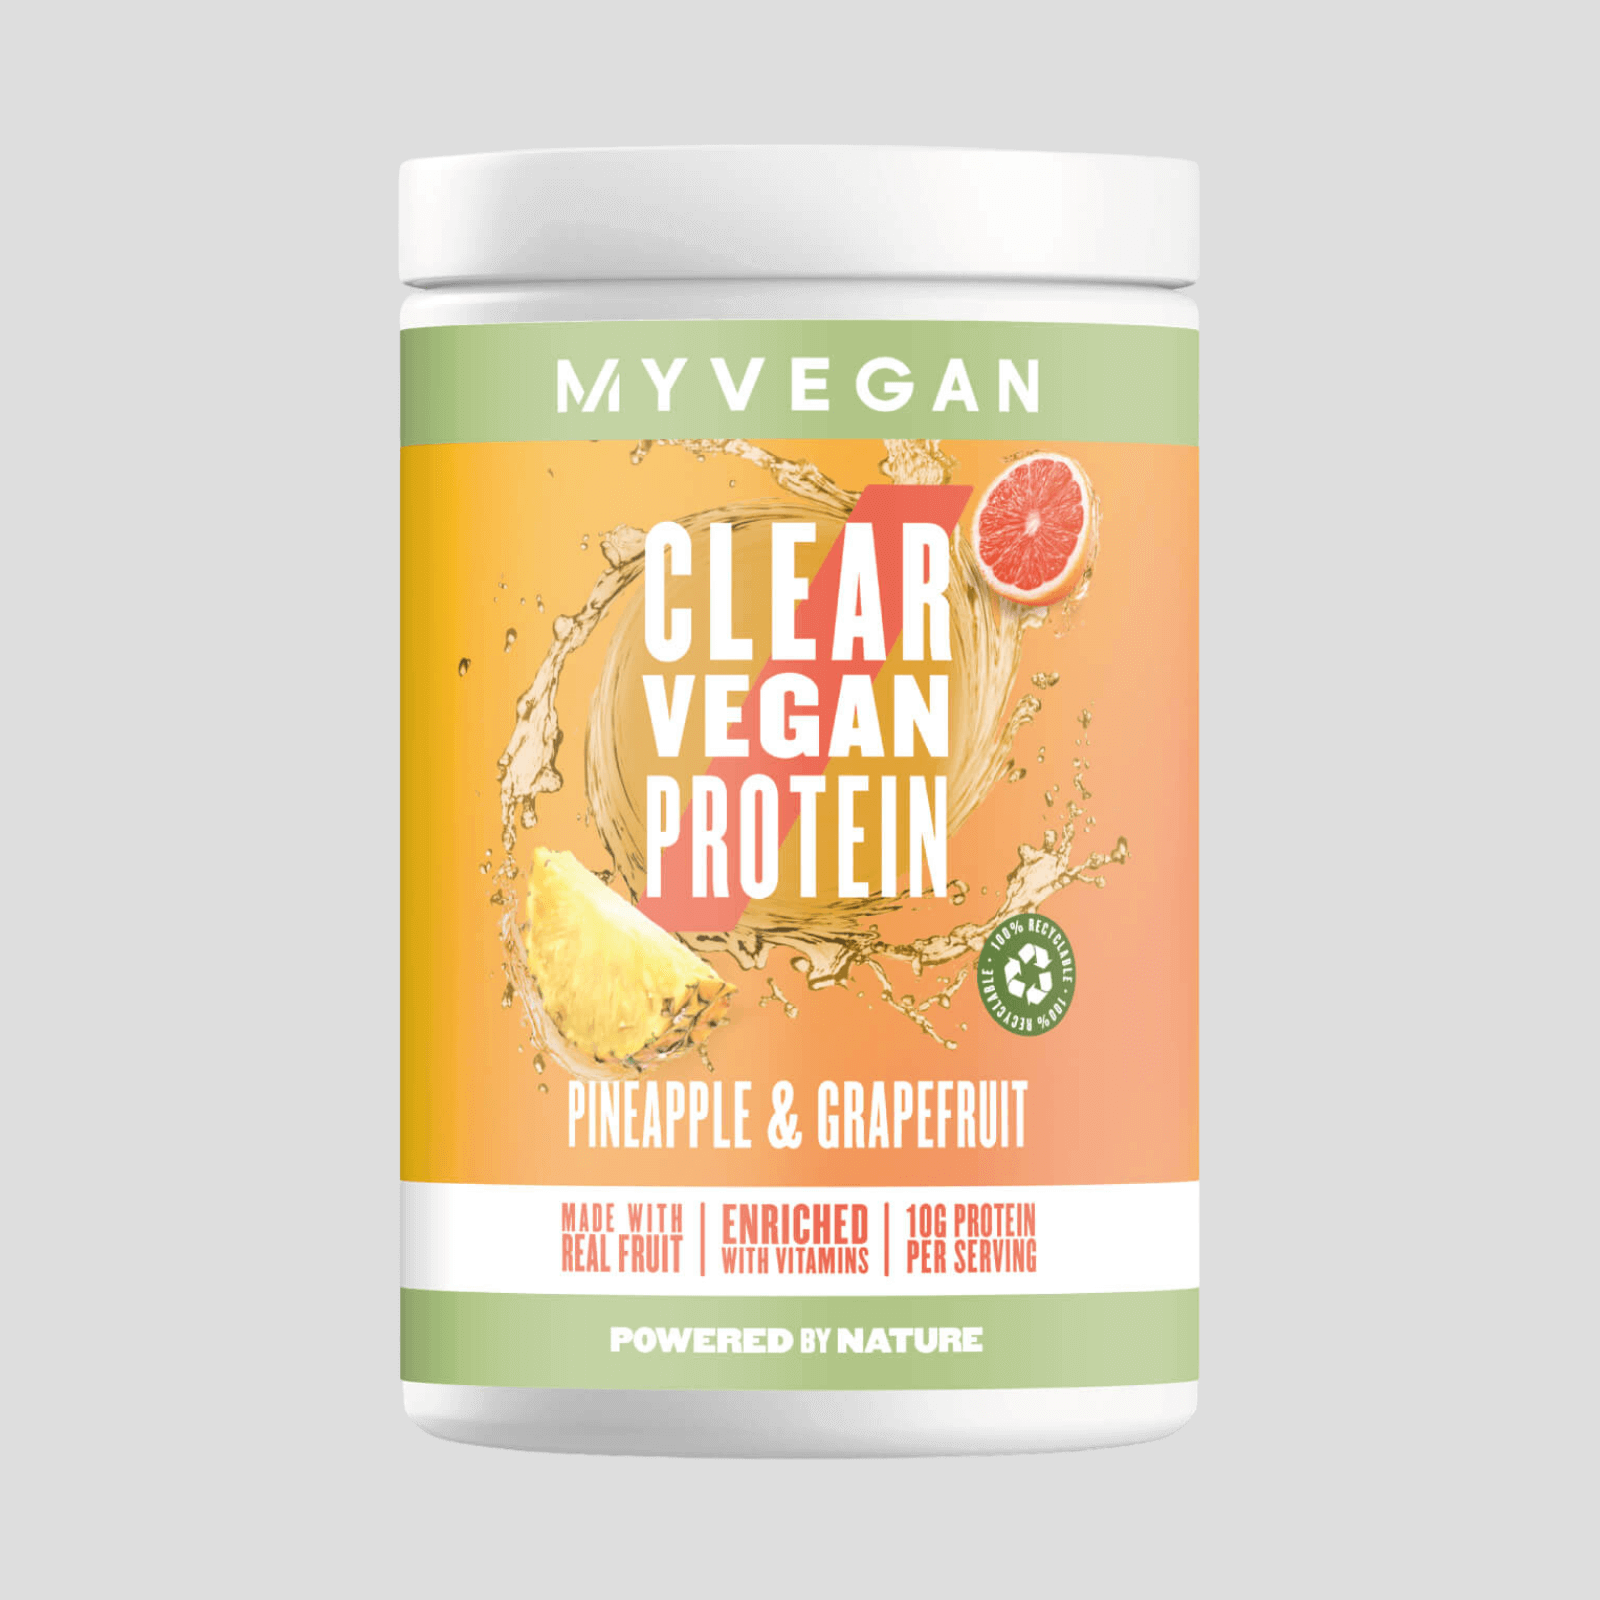 Clear Vegan Protein - 40servings - Pineapple & Grapefruit